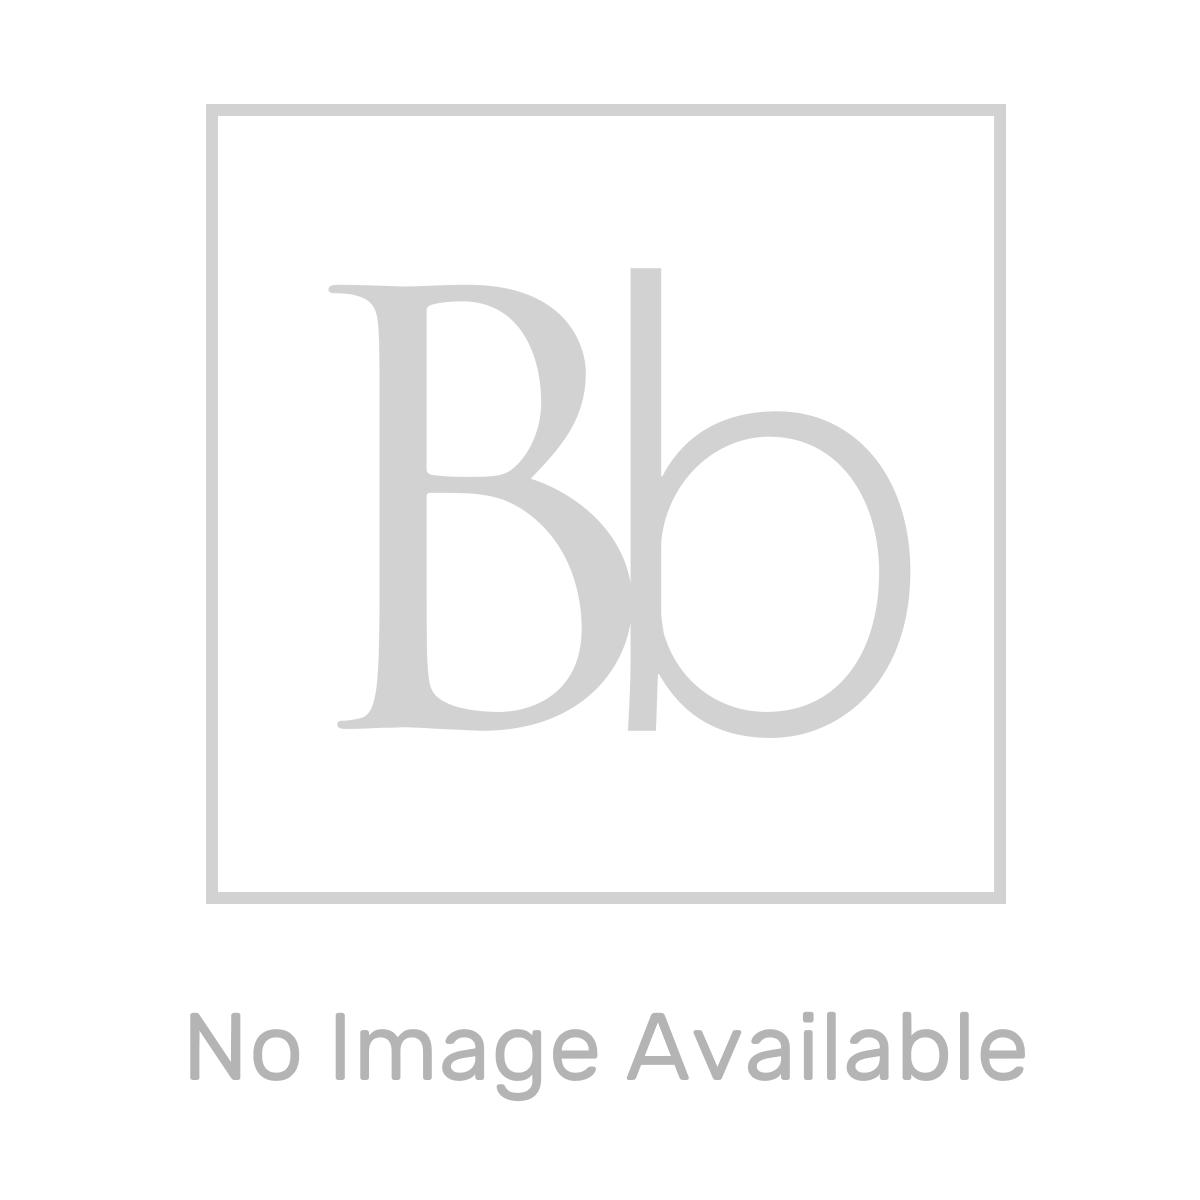 BTL Perla White 2 Drawer Wall Hung Vanity Unit 600mm